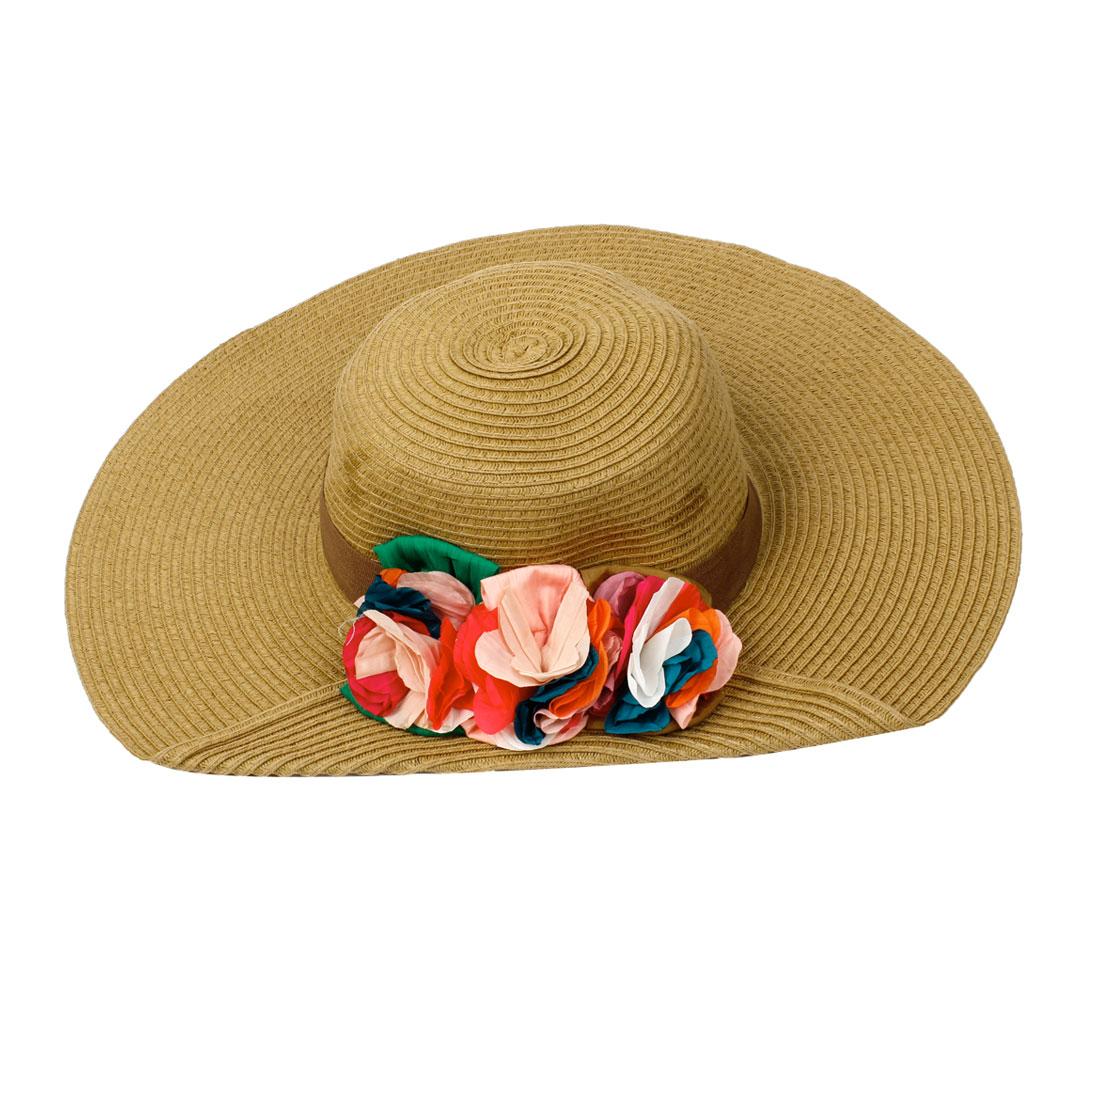 9cm Wide Brim Flower Detailing Summer Beach Hat Olive Green for Women